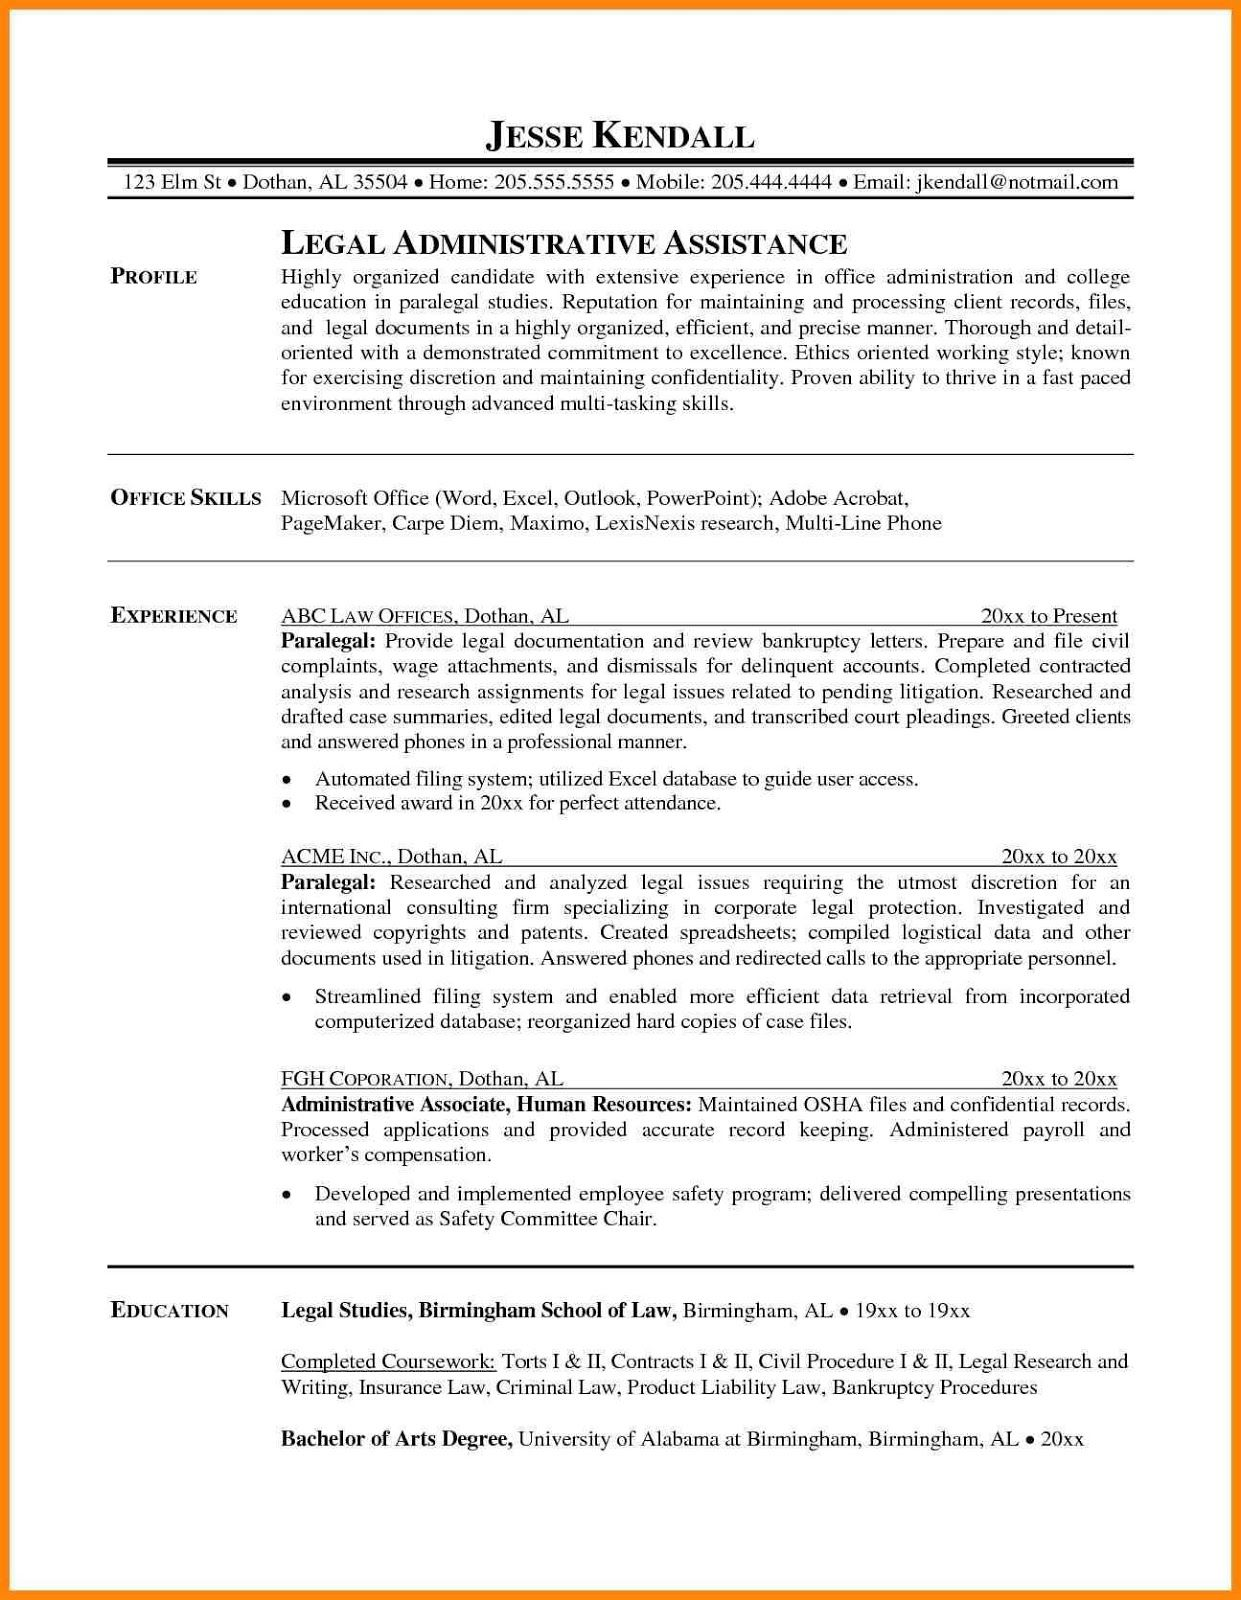 Paralegal Resume Sample Paralegal Resume Samples Paralegal Resume Sample 2018 Paralegal Resume Sample 2017 Paralegal Resume Sample No Experience Para Resume